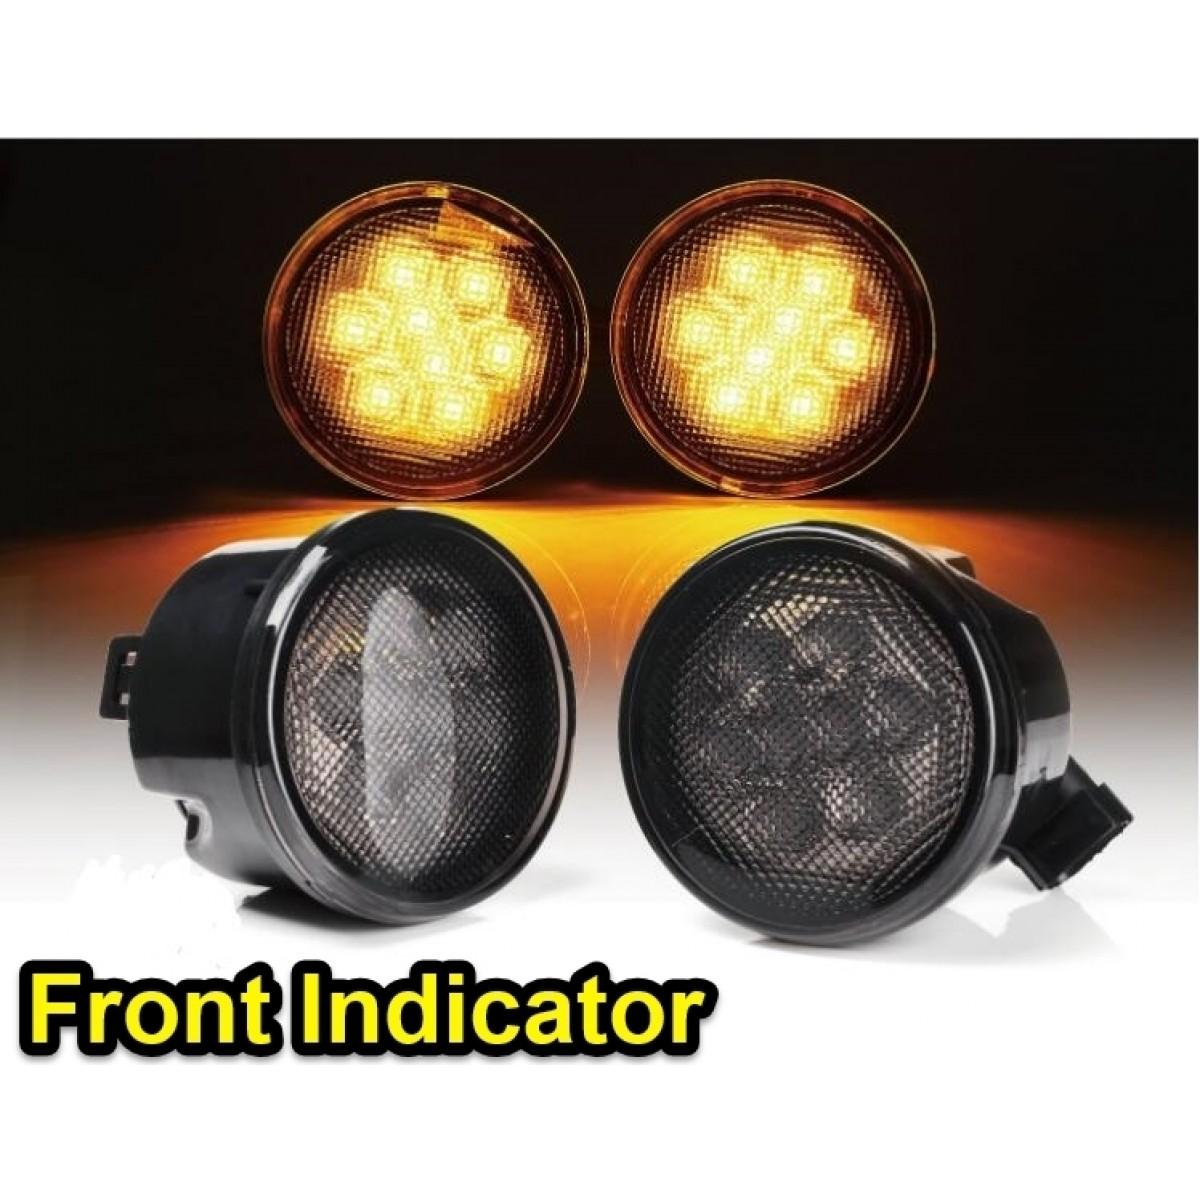 Osjs Jeep Wrangler Jk Tinted Front Indicator Lights